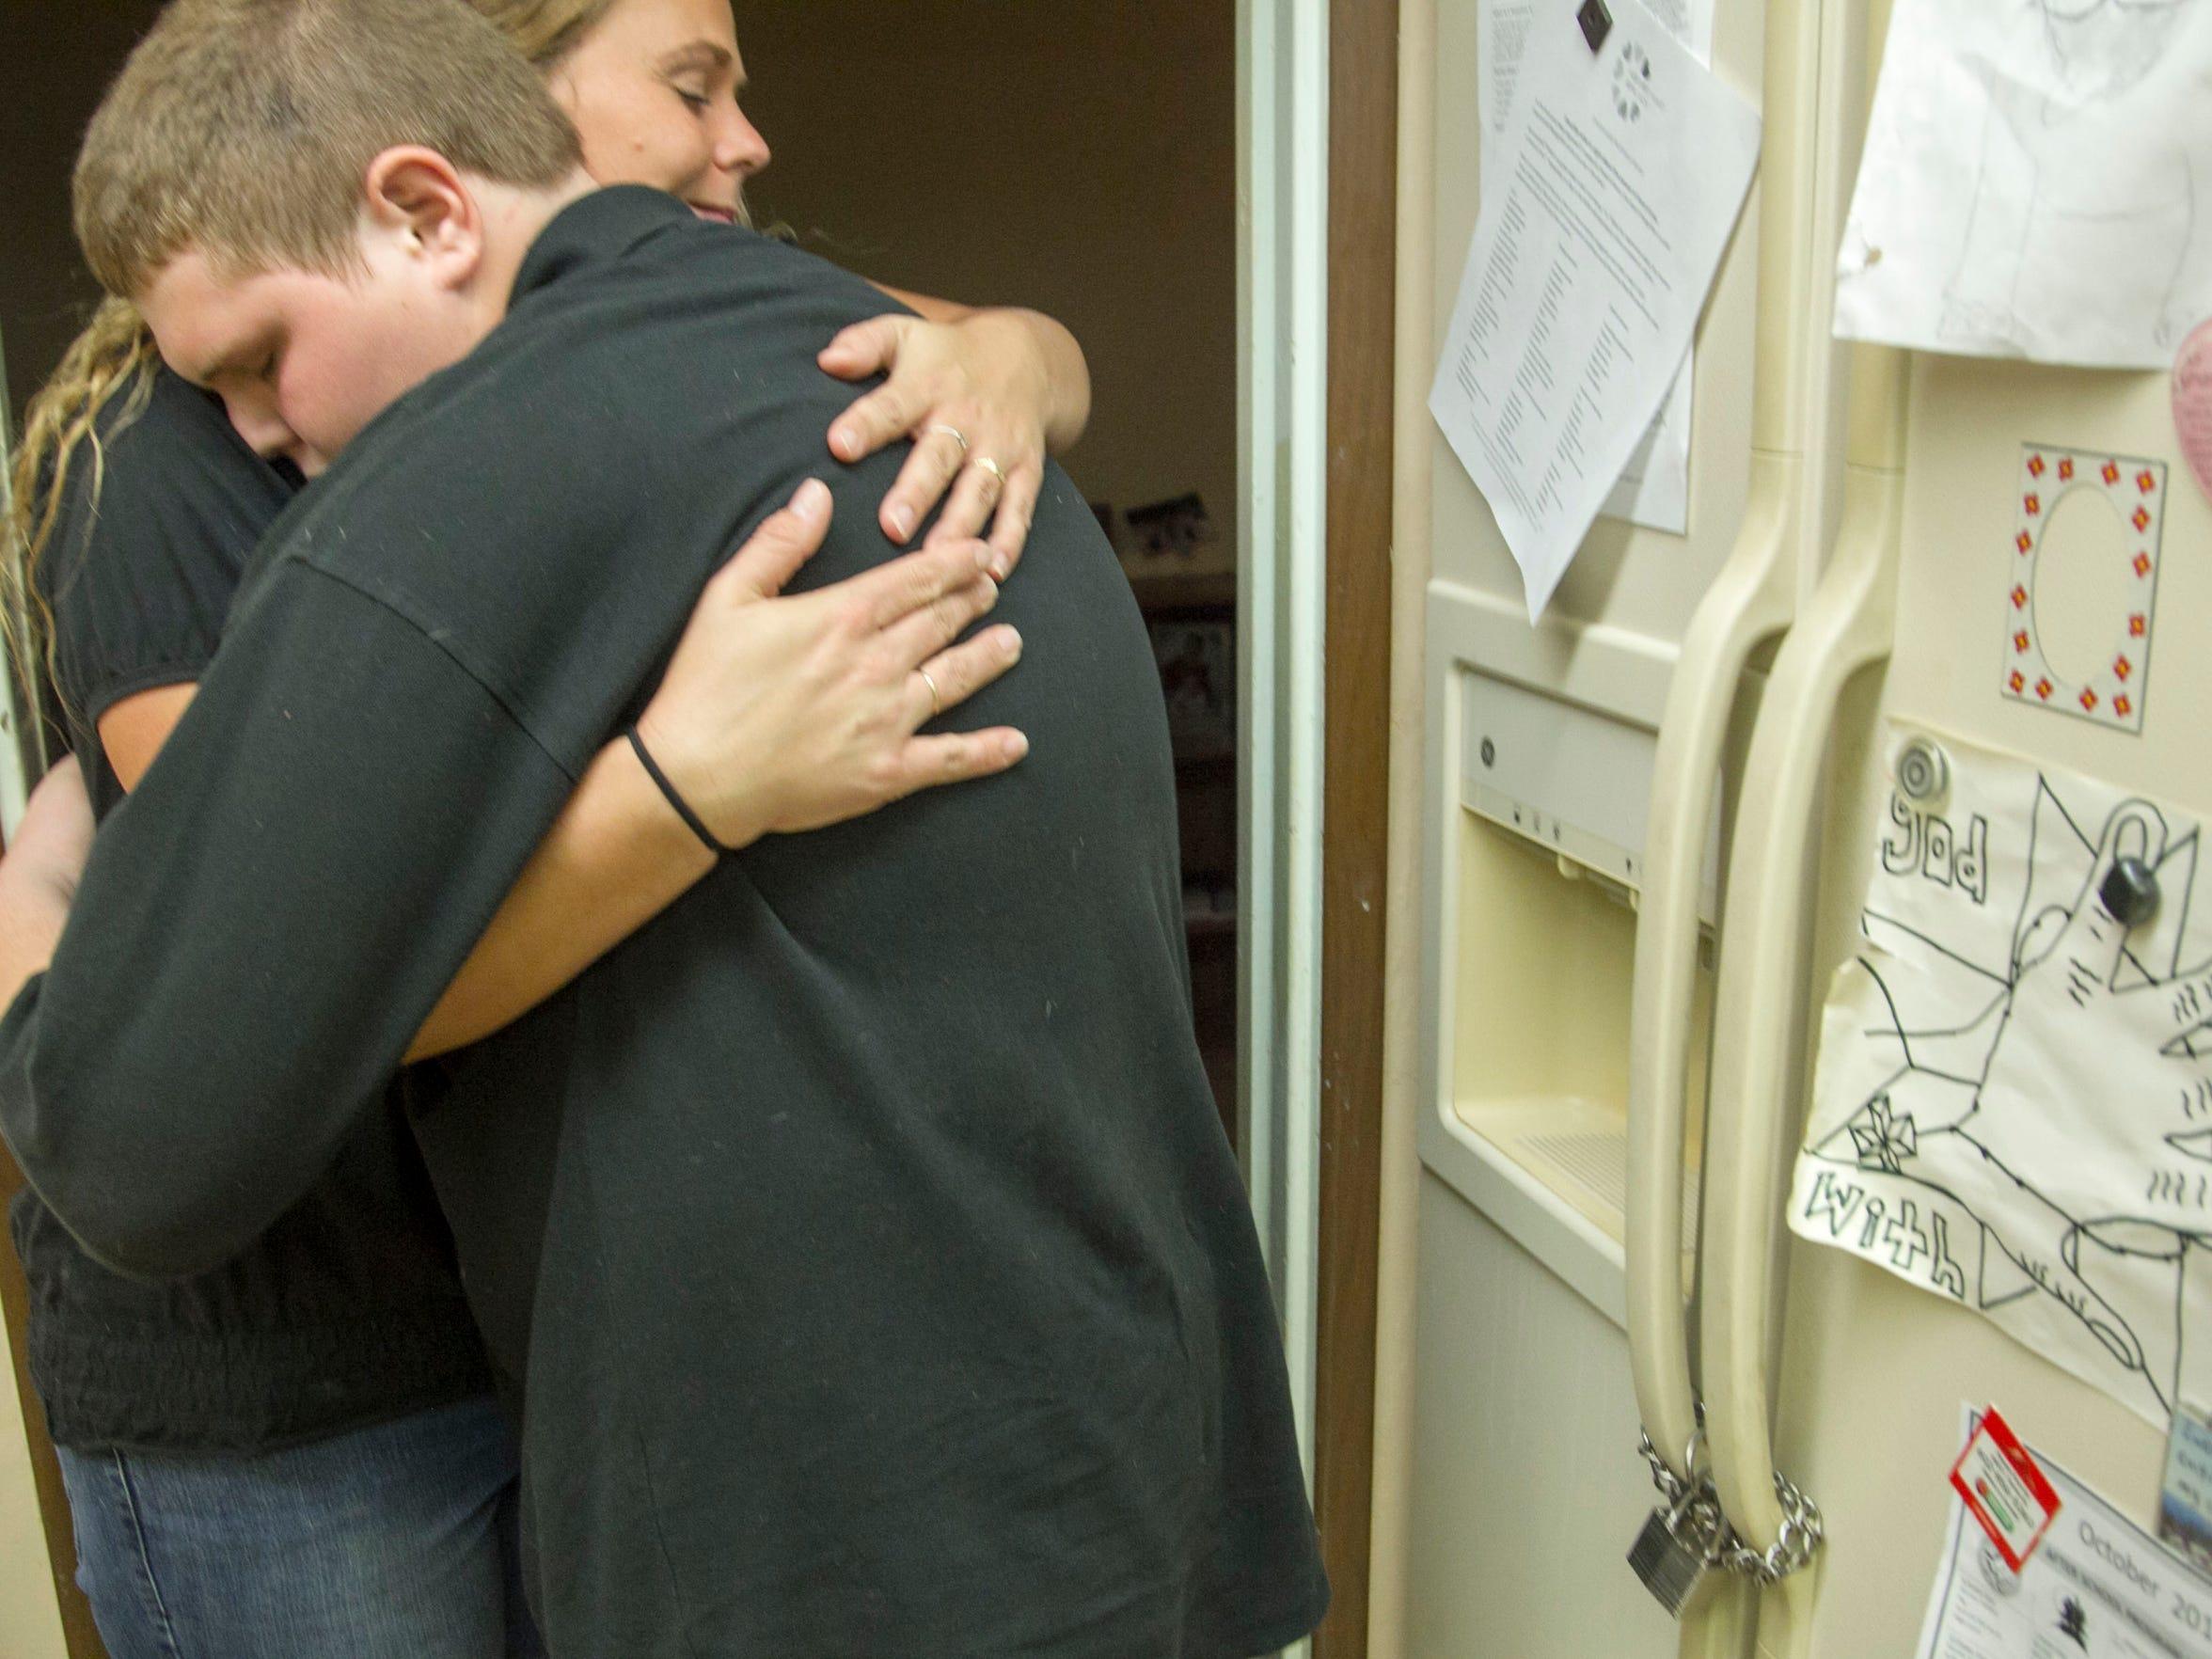 Misty Kidder, a Phoenix mother, hugs her son Austin